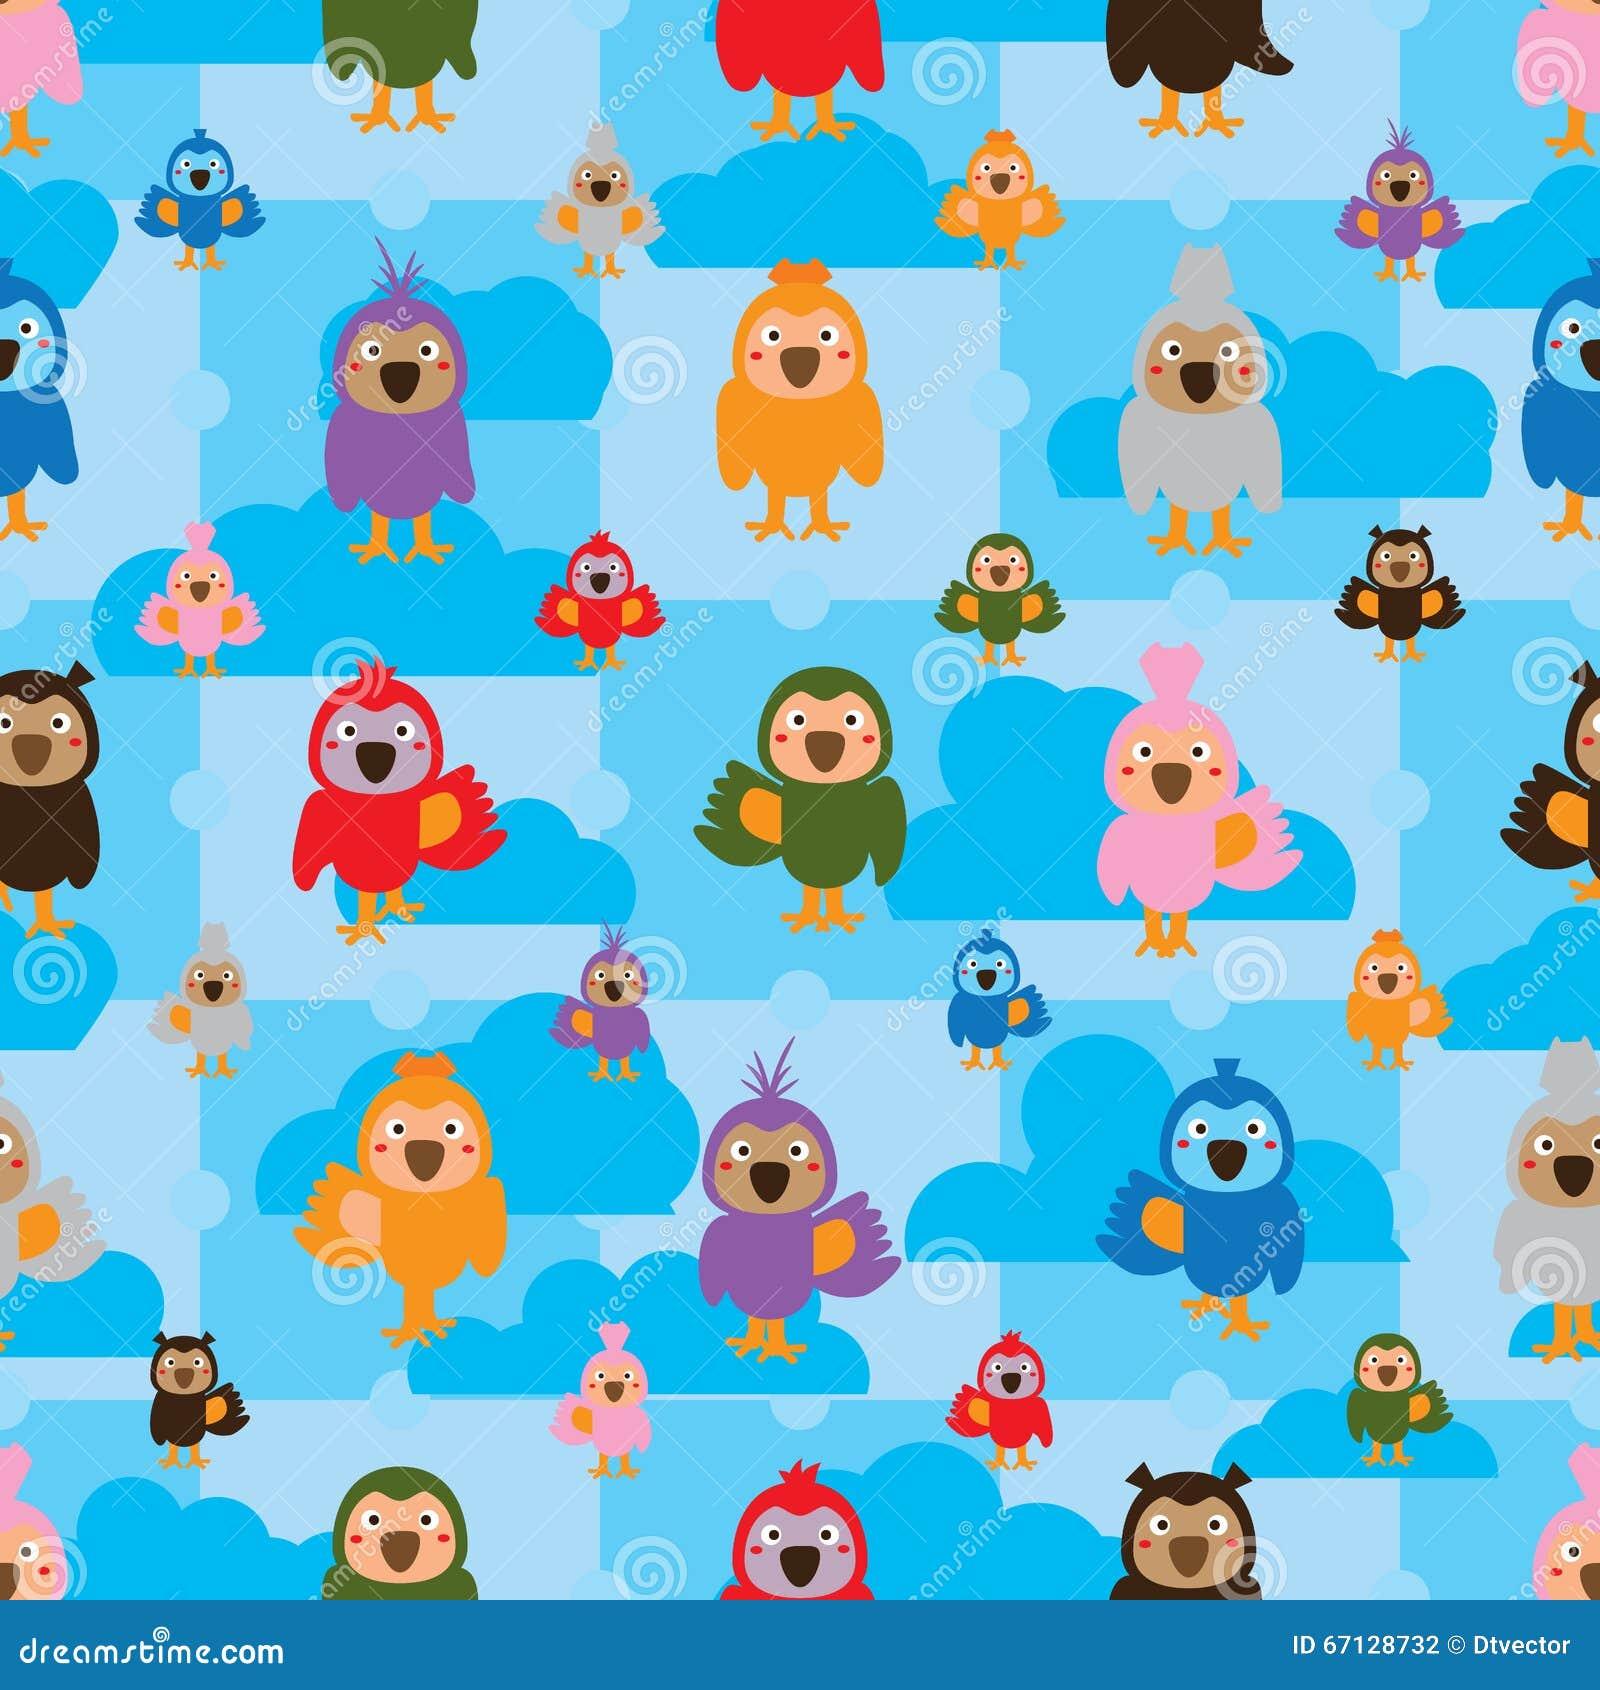 Cartoon Bird Color Symmetry Cloud Seamless Pattern Stock Photo ...